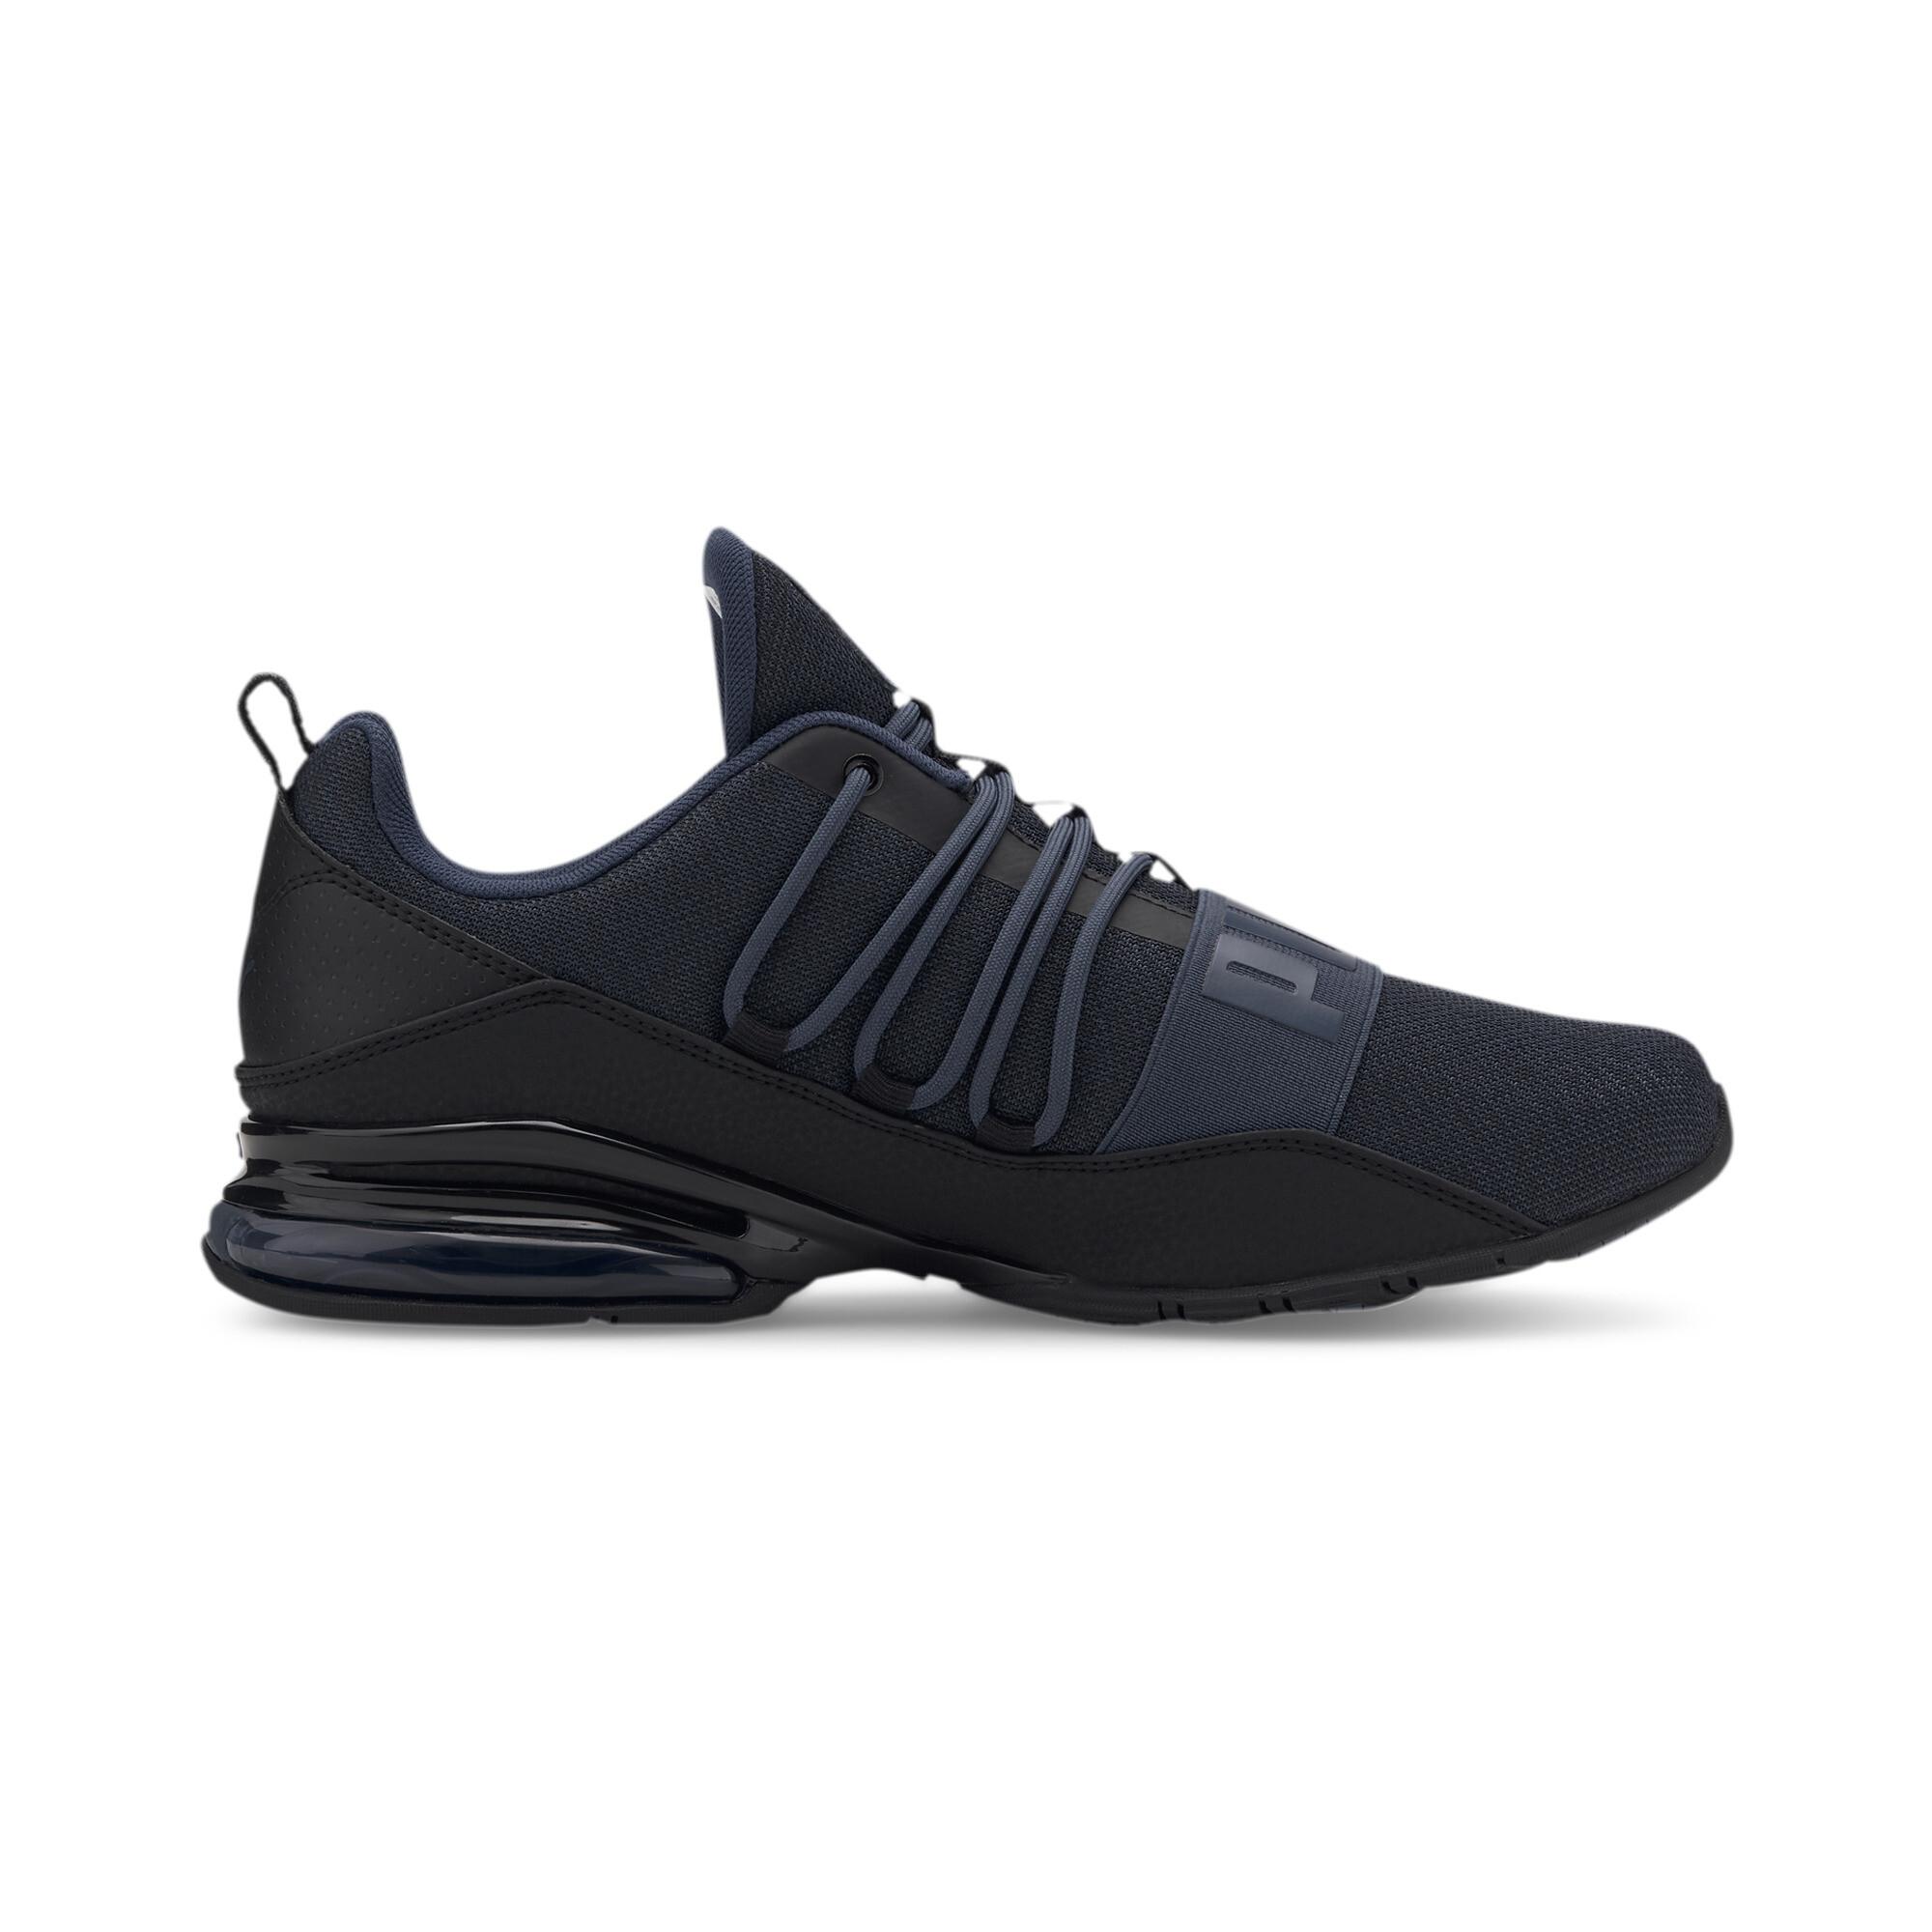 PUMA-Men-039-s-CELL-Regulate-Bold-Training-Shoes thumbnail 7